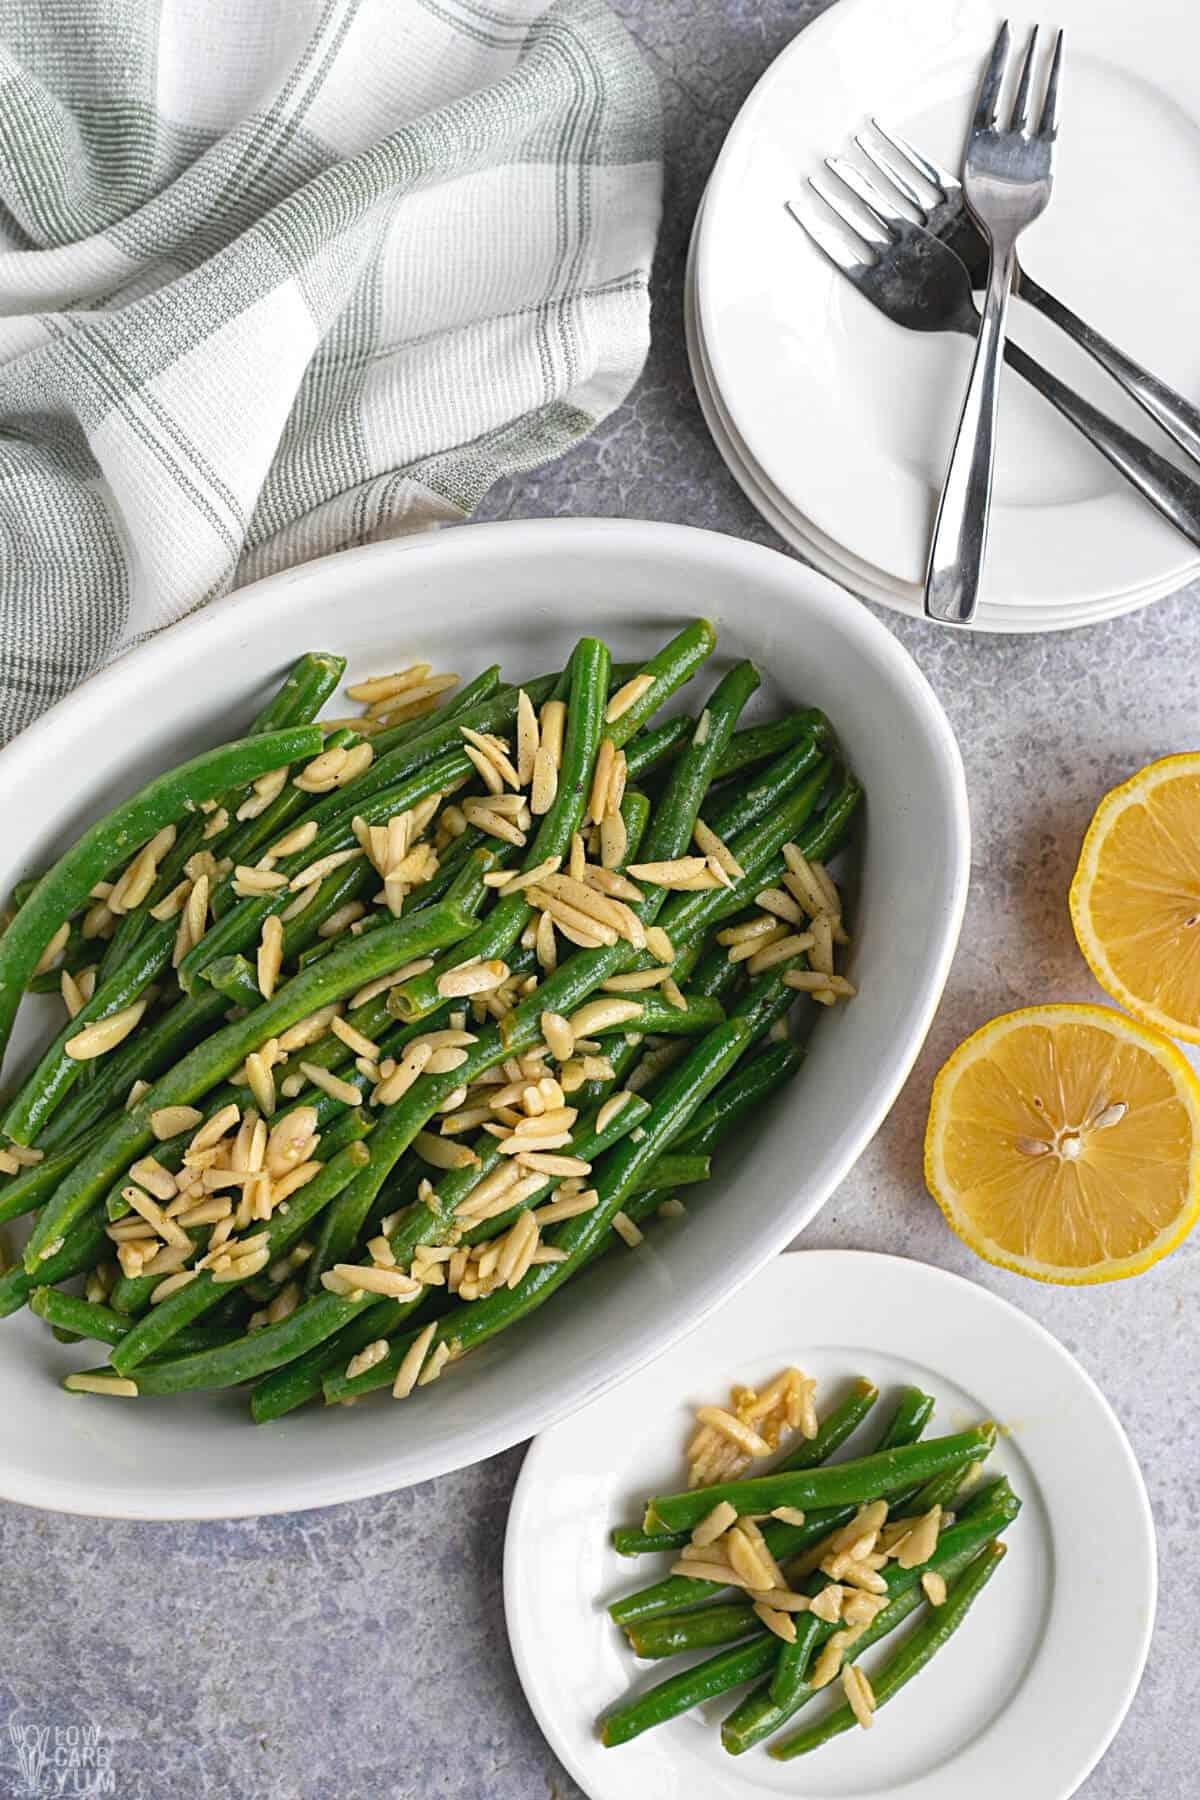 green beans almondine recipe served on white plate